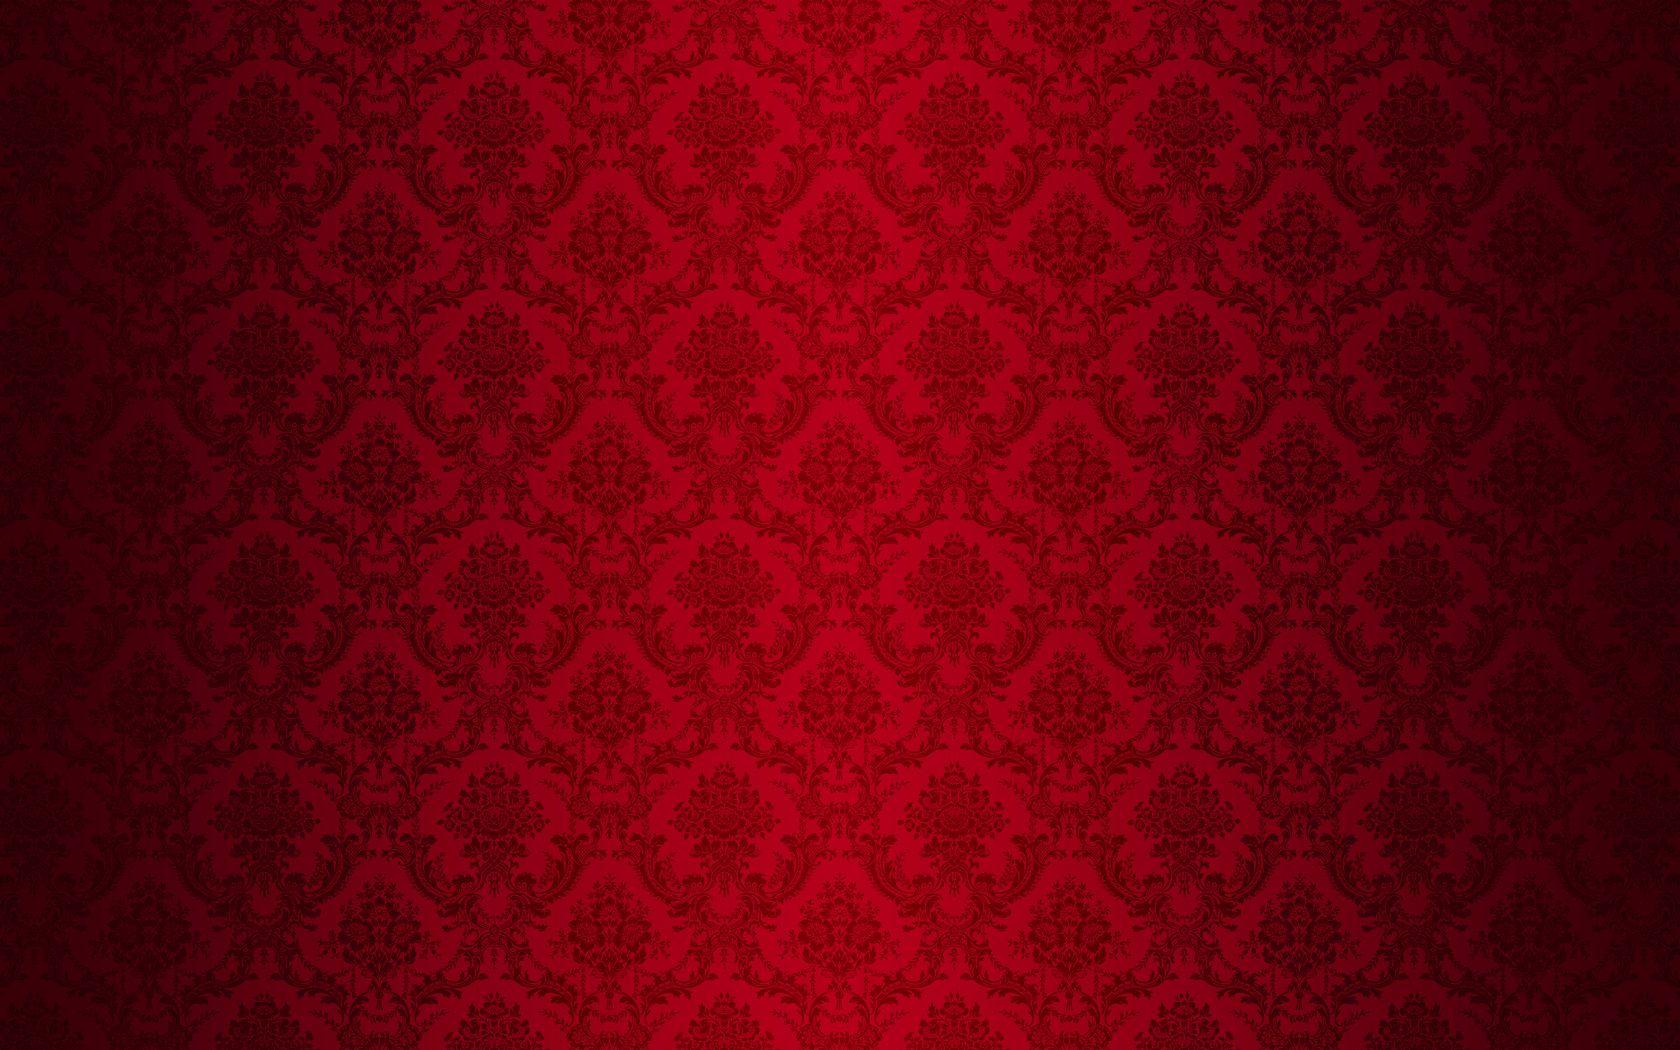 Red And Black Damask Wallpaper Damask Wallpaper Red Damask Red And Black Background